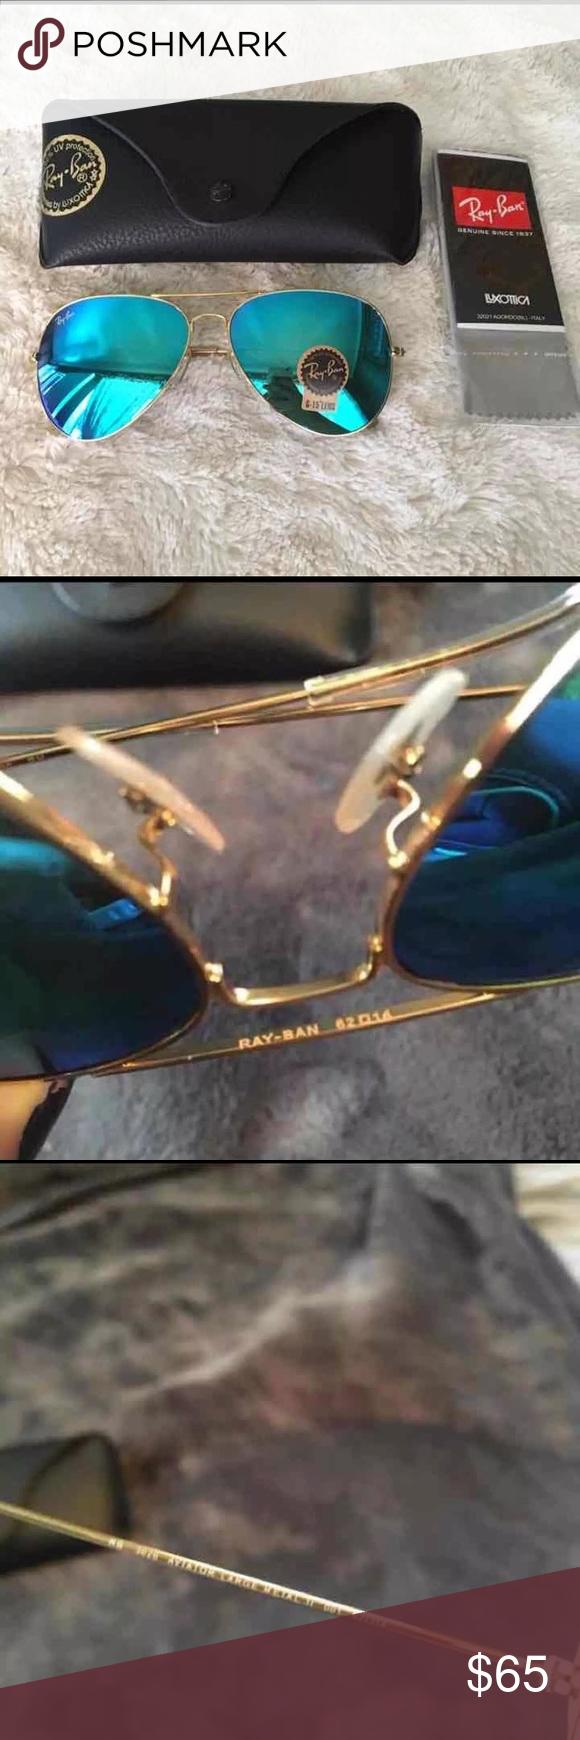 Ray Ban Aviator Sunglasses Aqua Blue New 62mm Lens Ray Ban Aviator ...